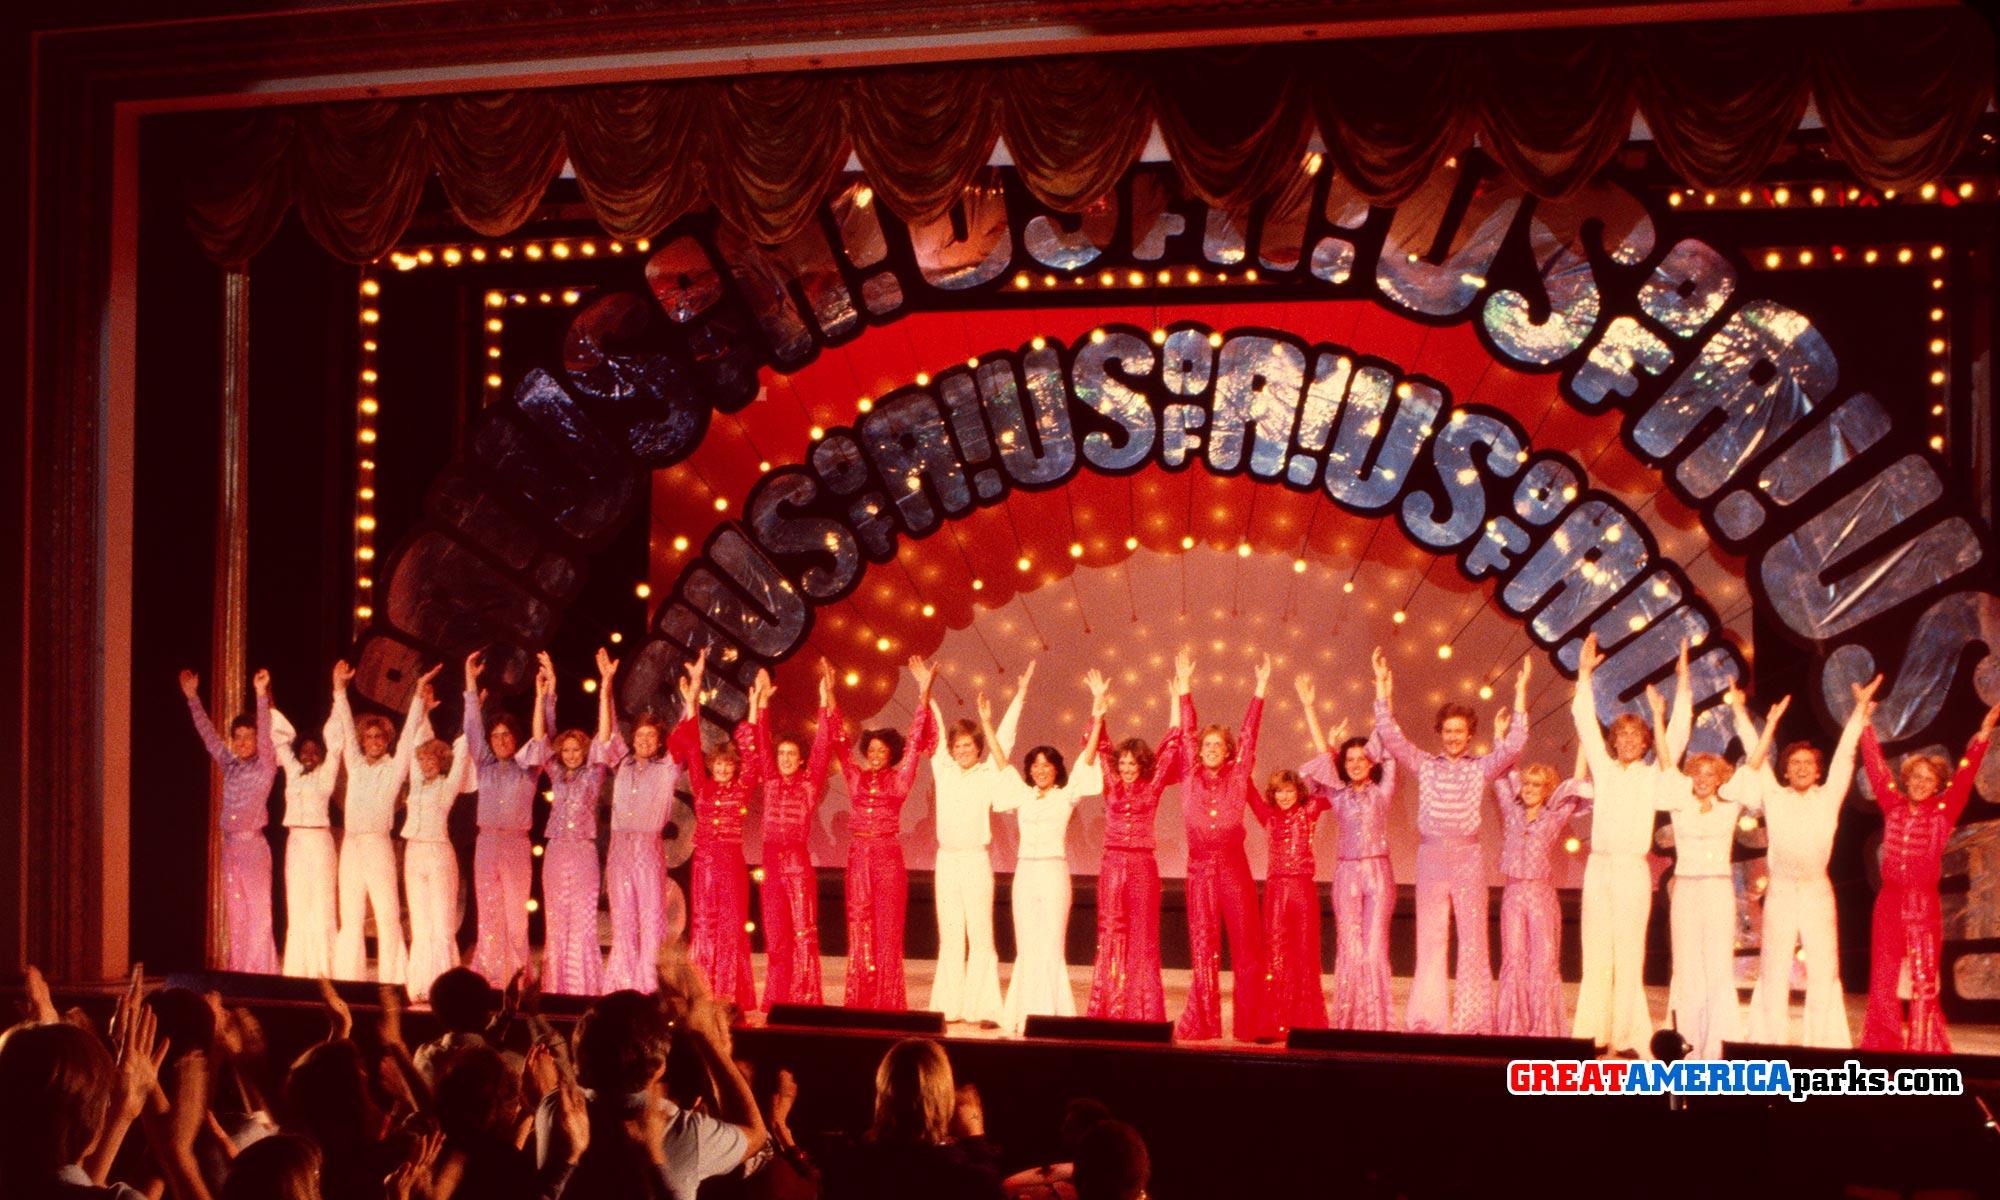 Marriott's Great America shows: Music! America! 1976